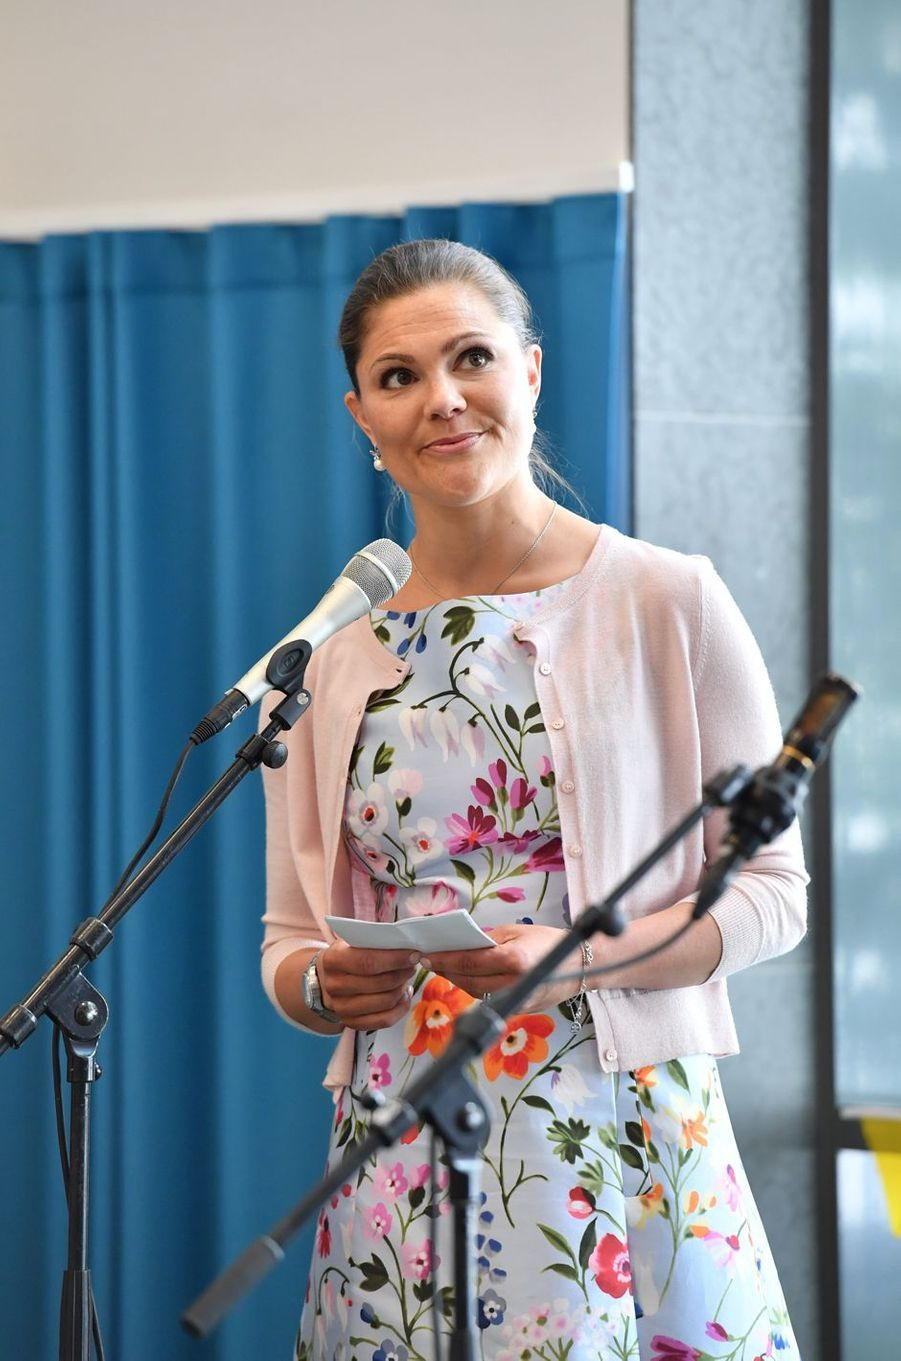 La princesse Victoria de Suède à Nacka, le 6 juin 2016